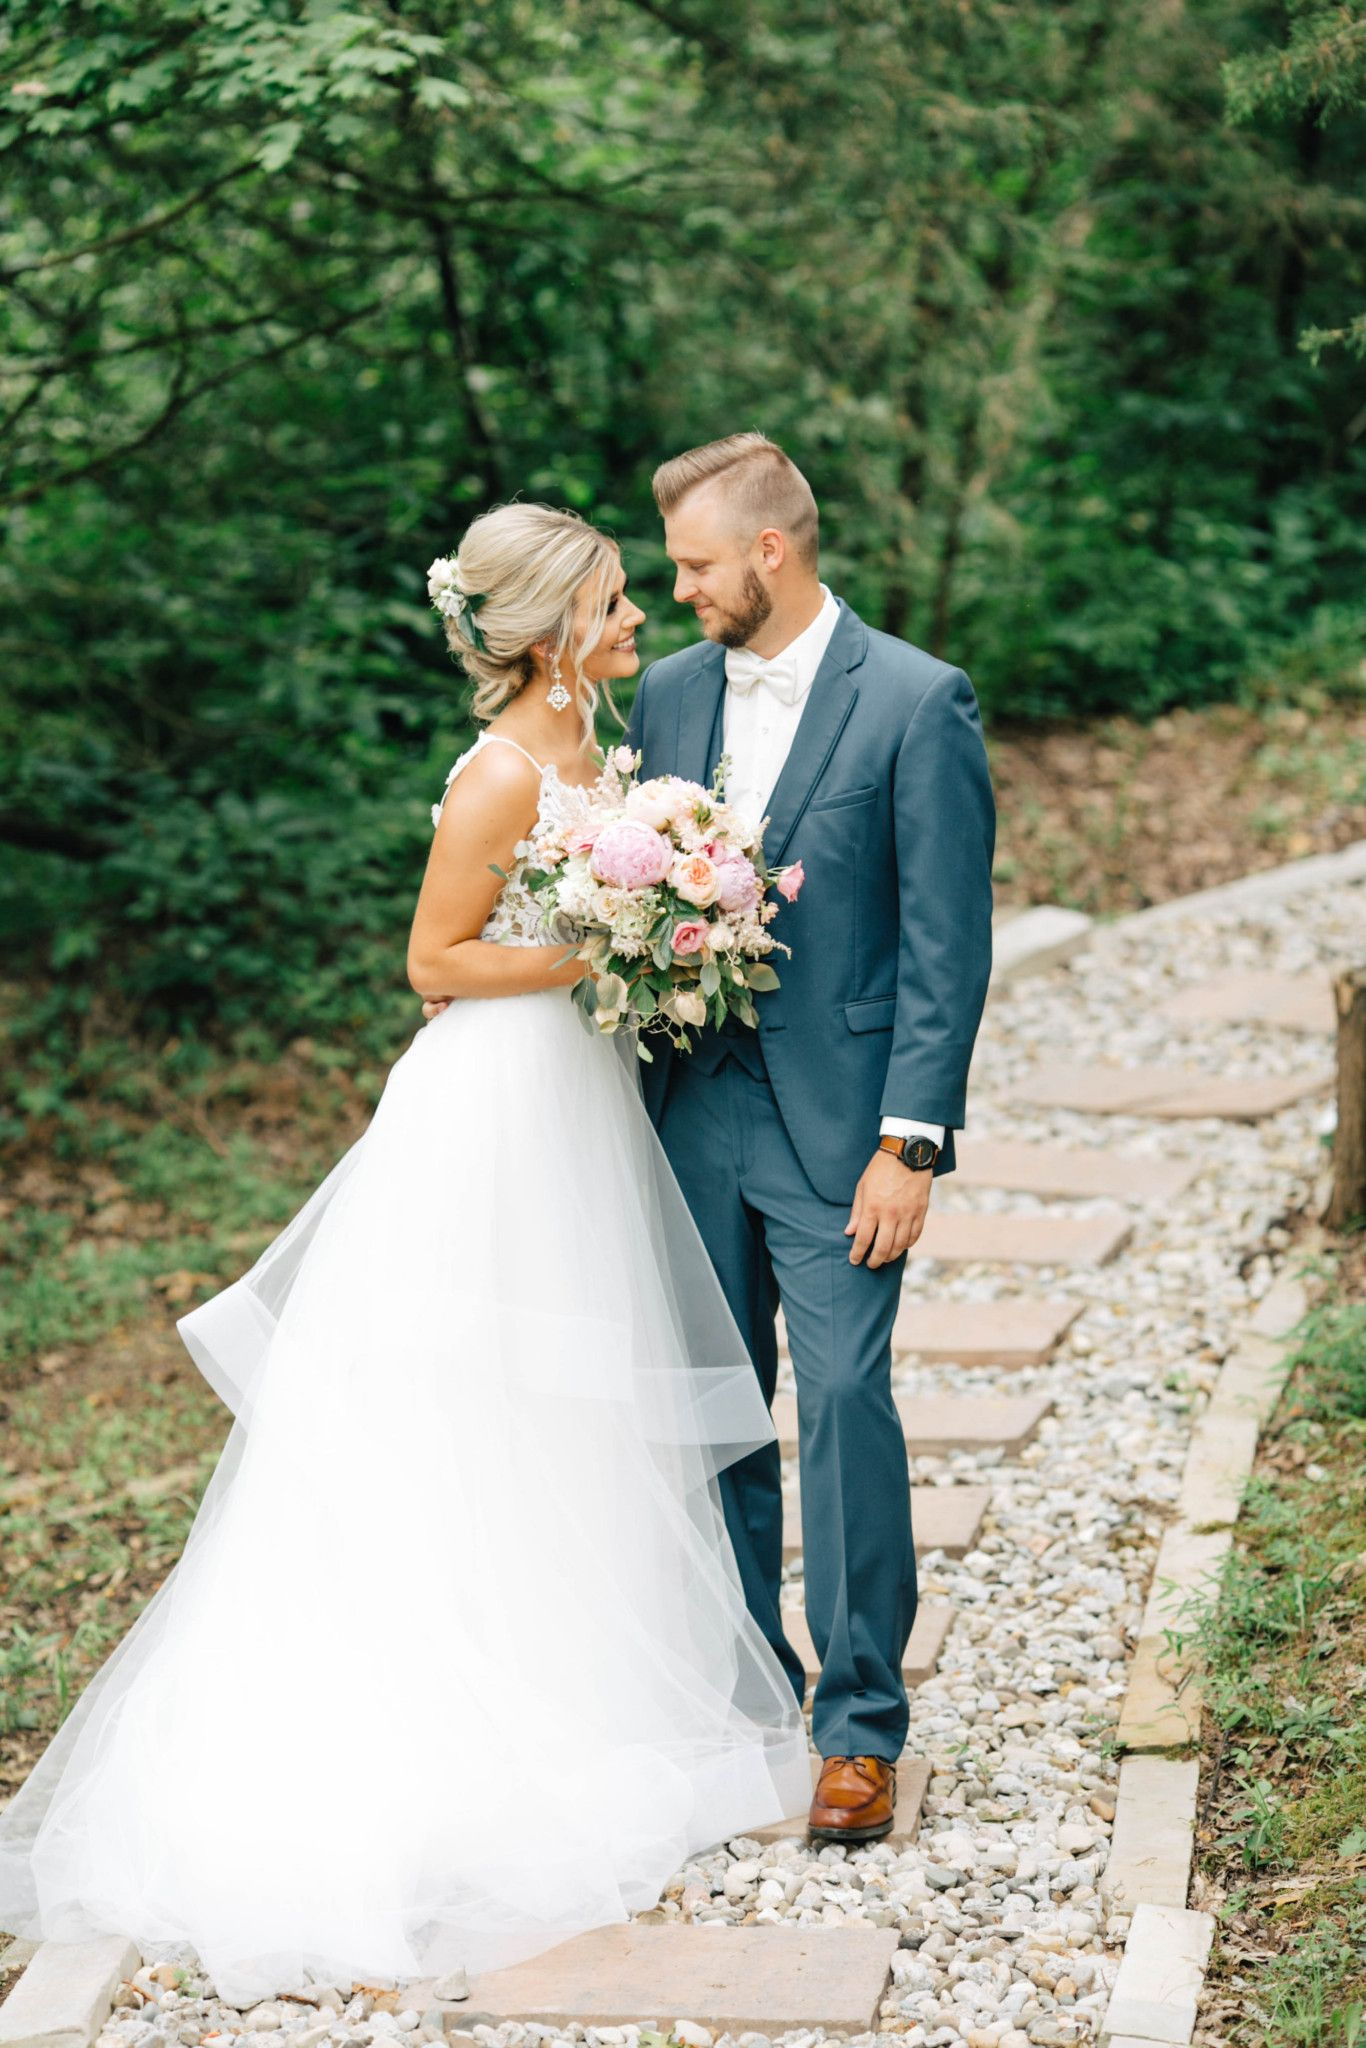 Kentucky Barn Wedding Reception Corporate Retreat Country Wedding Summer Wedding Country Wedding Gowns [ 2048 x 1366 Pixel ]